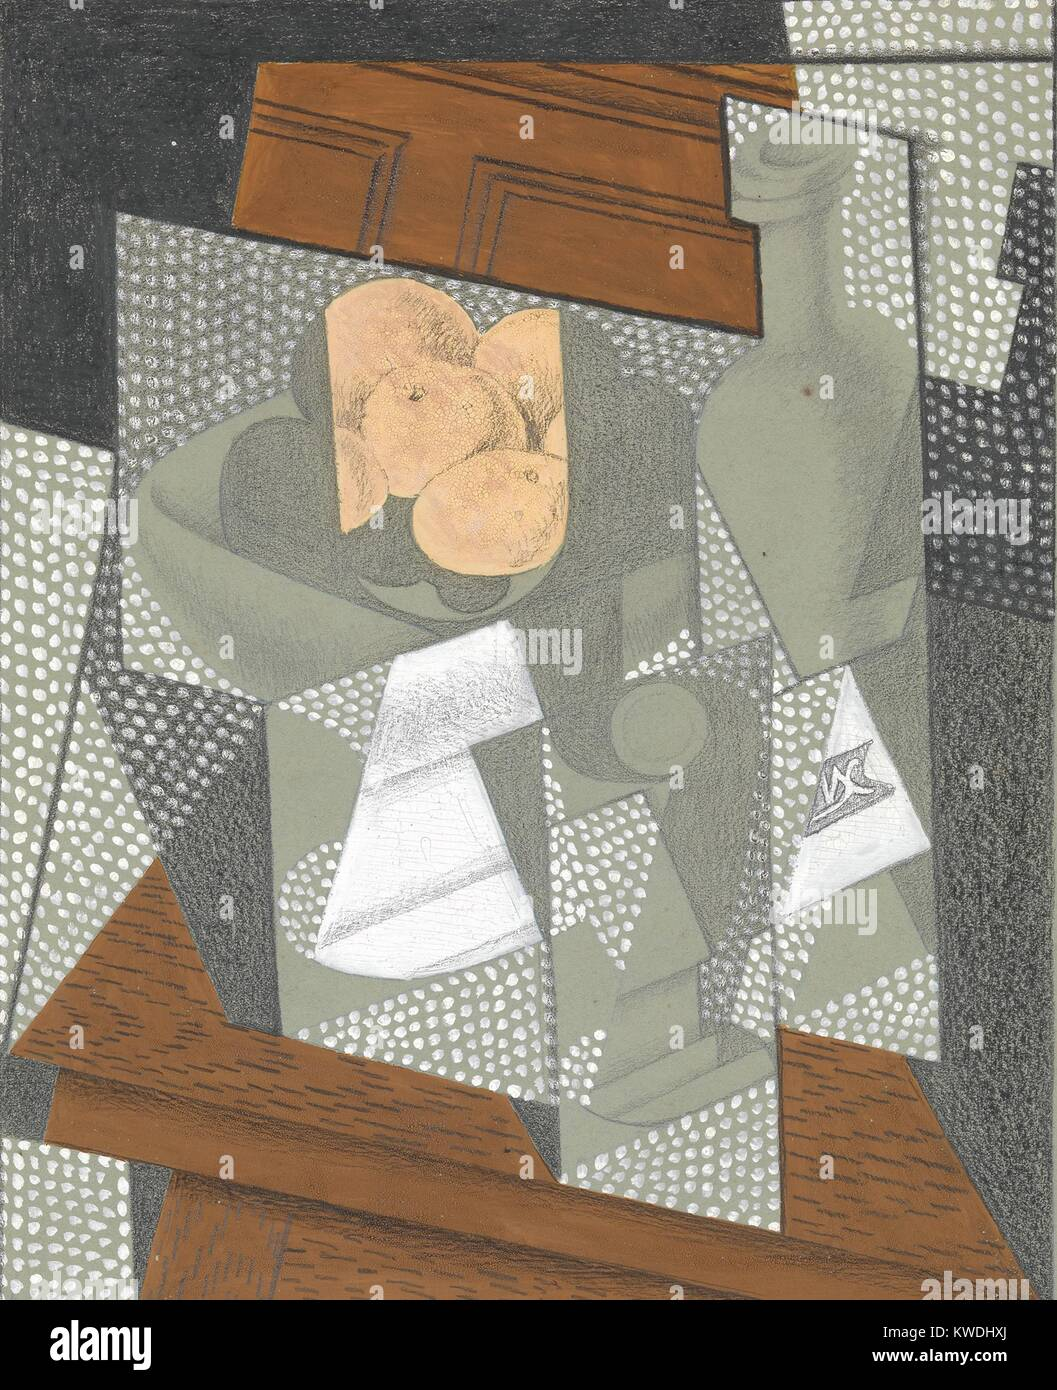 El cuenco de fruta, de Juan Gris, 1915-16, Español cubista, grafito, lápiz de cera, aguada dibujo. Este Imagen De Stock